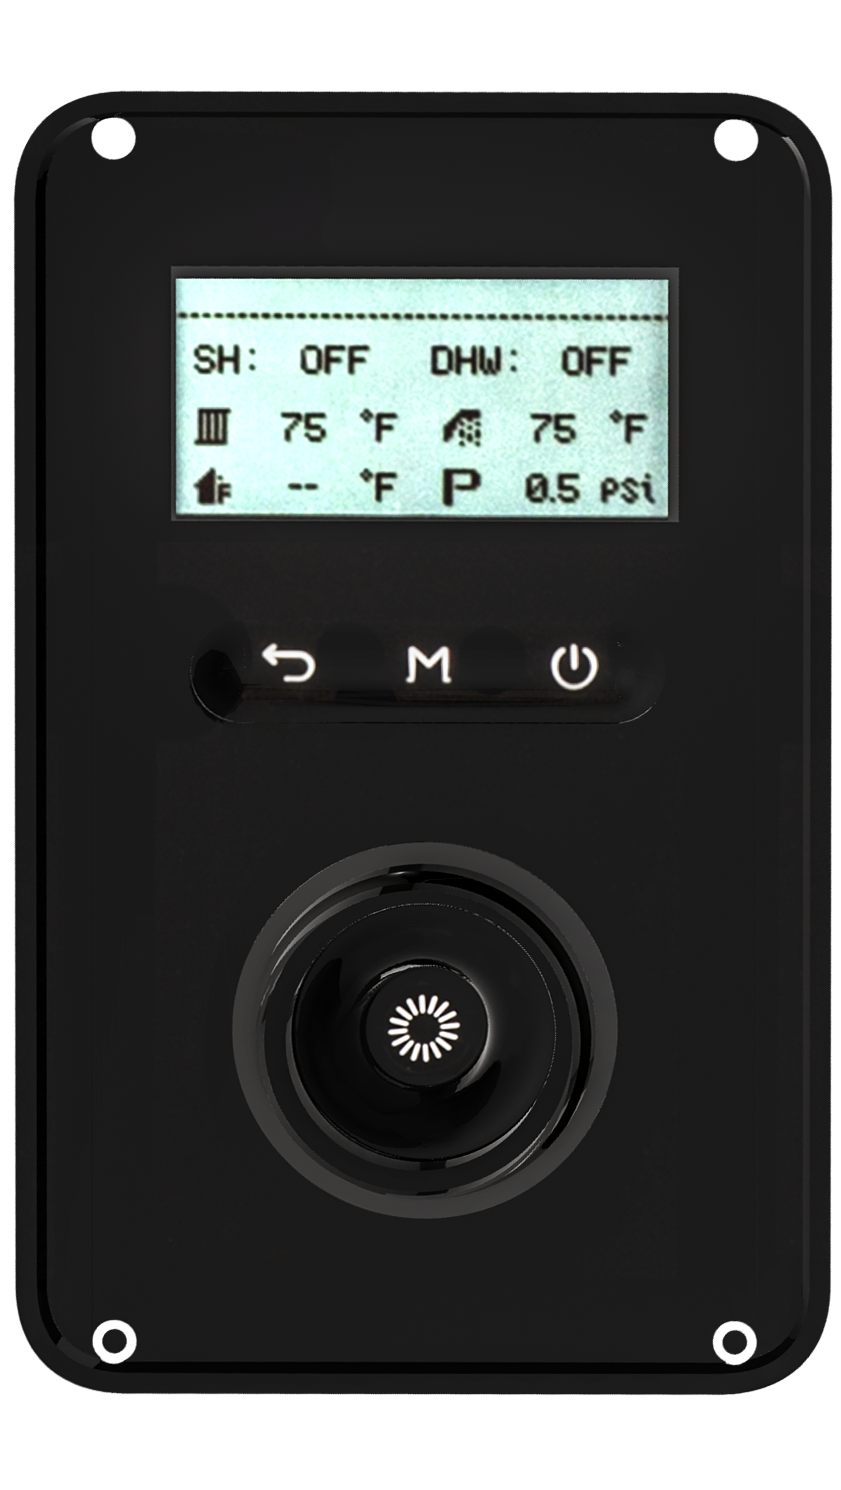 Nfb control panel w alpha hr 2